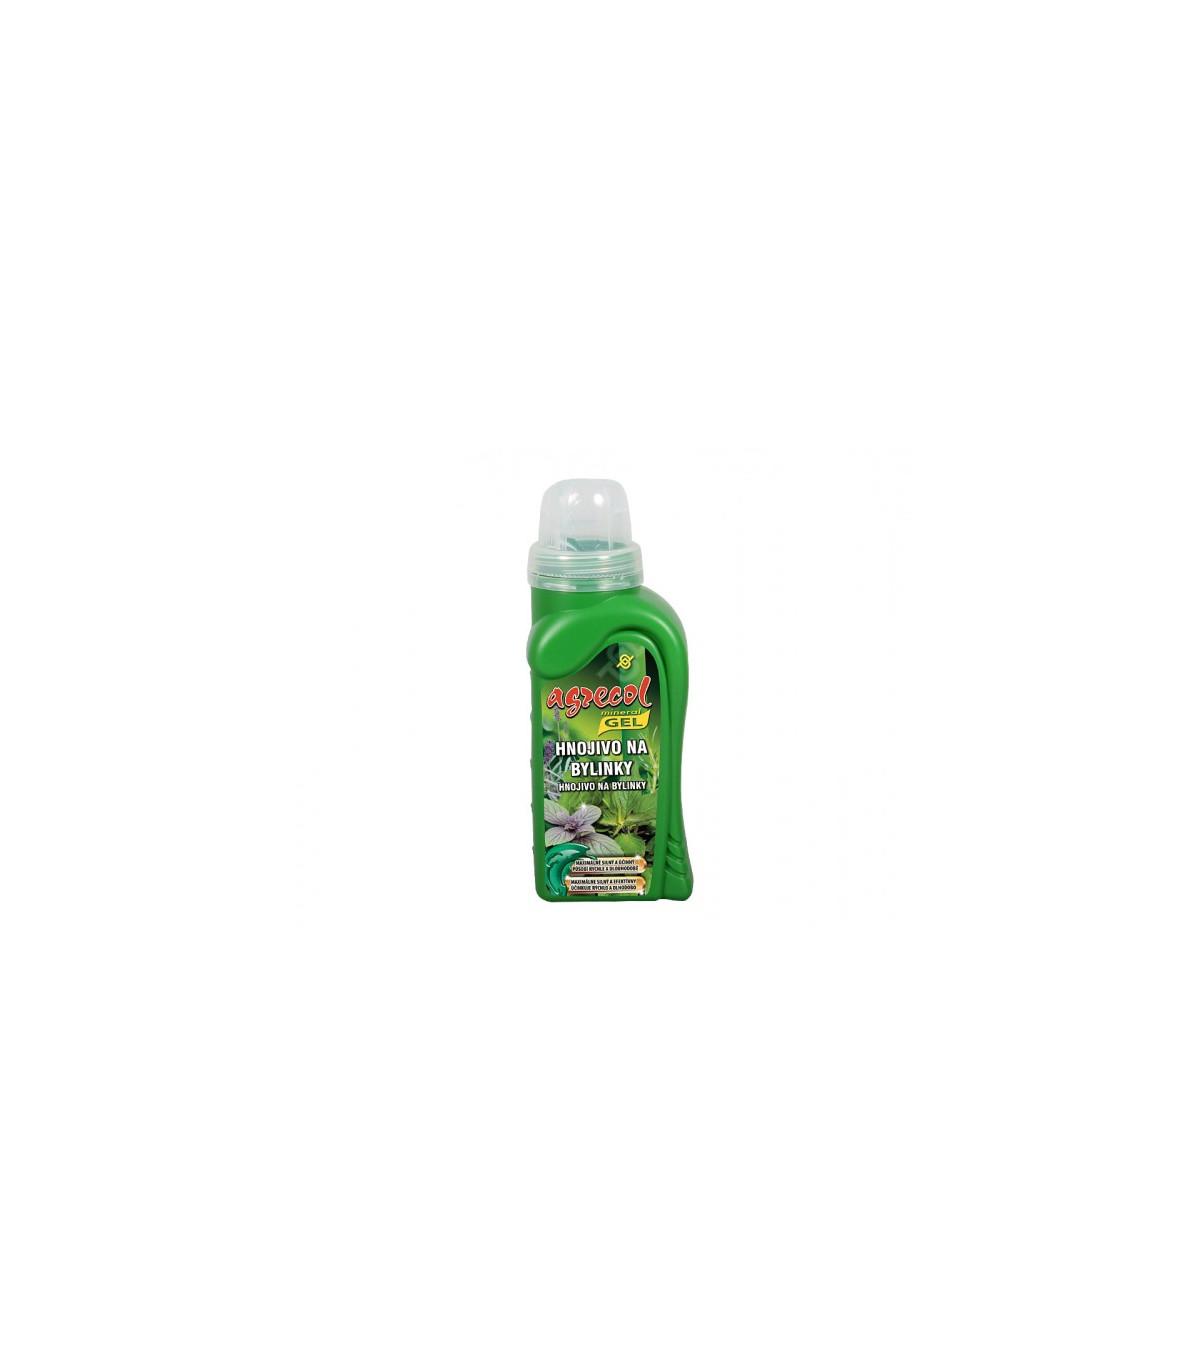 Hnojivo na pro bylinky - gel - Agrecol -  250 ml